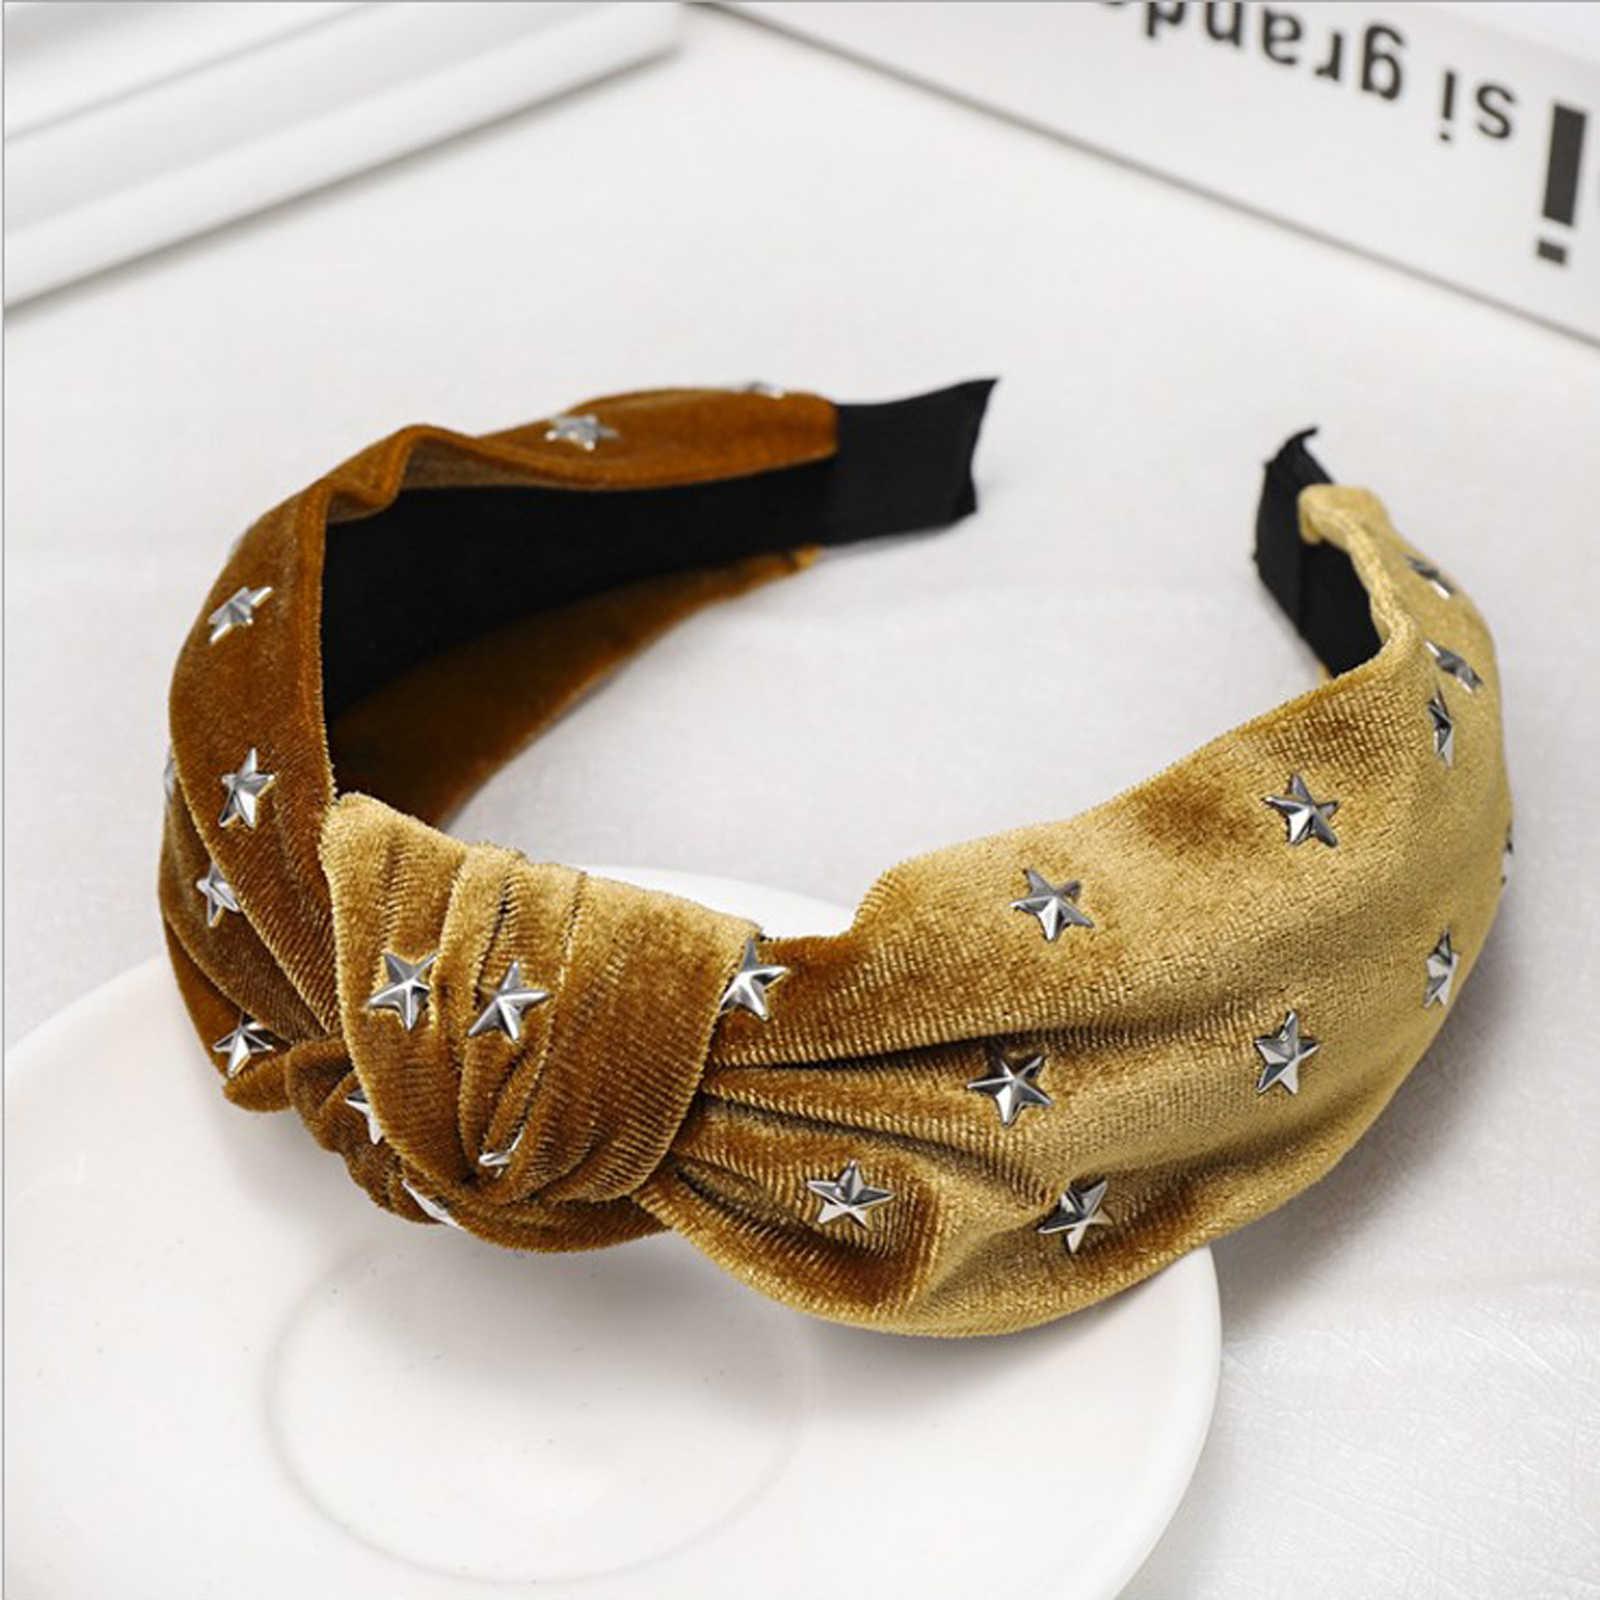 Baru Fashion Lembut Flanel Hairband Wanita Kasual Ikat Kepala Dewasa Emas Hiasan Kepala Pusat Simpul Sorban Rambut Grosir Aksesoris